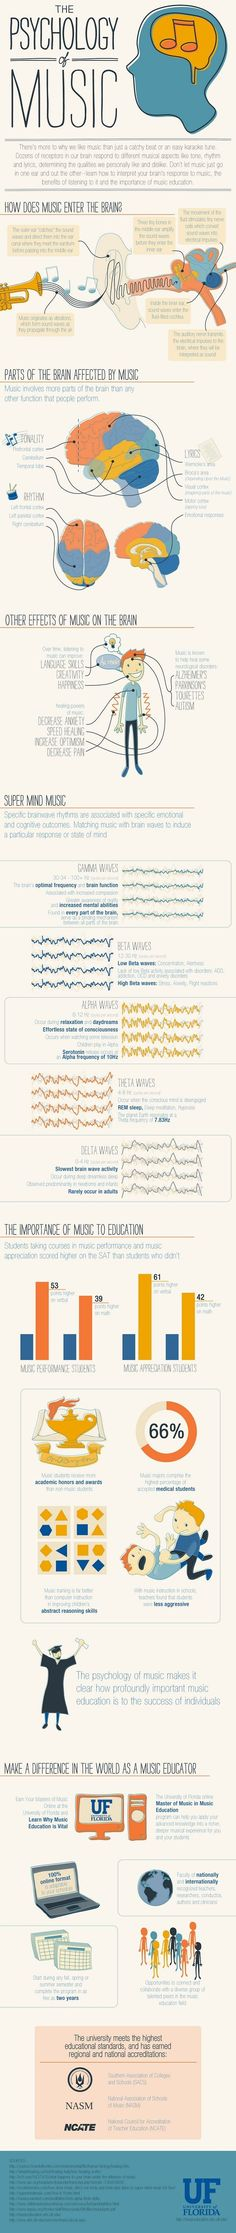 La psicología de la música #infografia #infographic #psychology